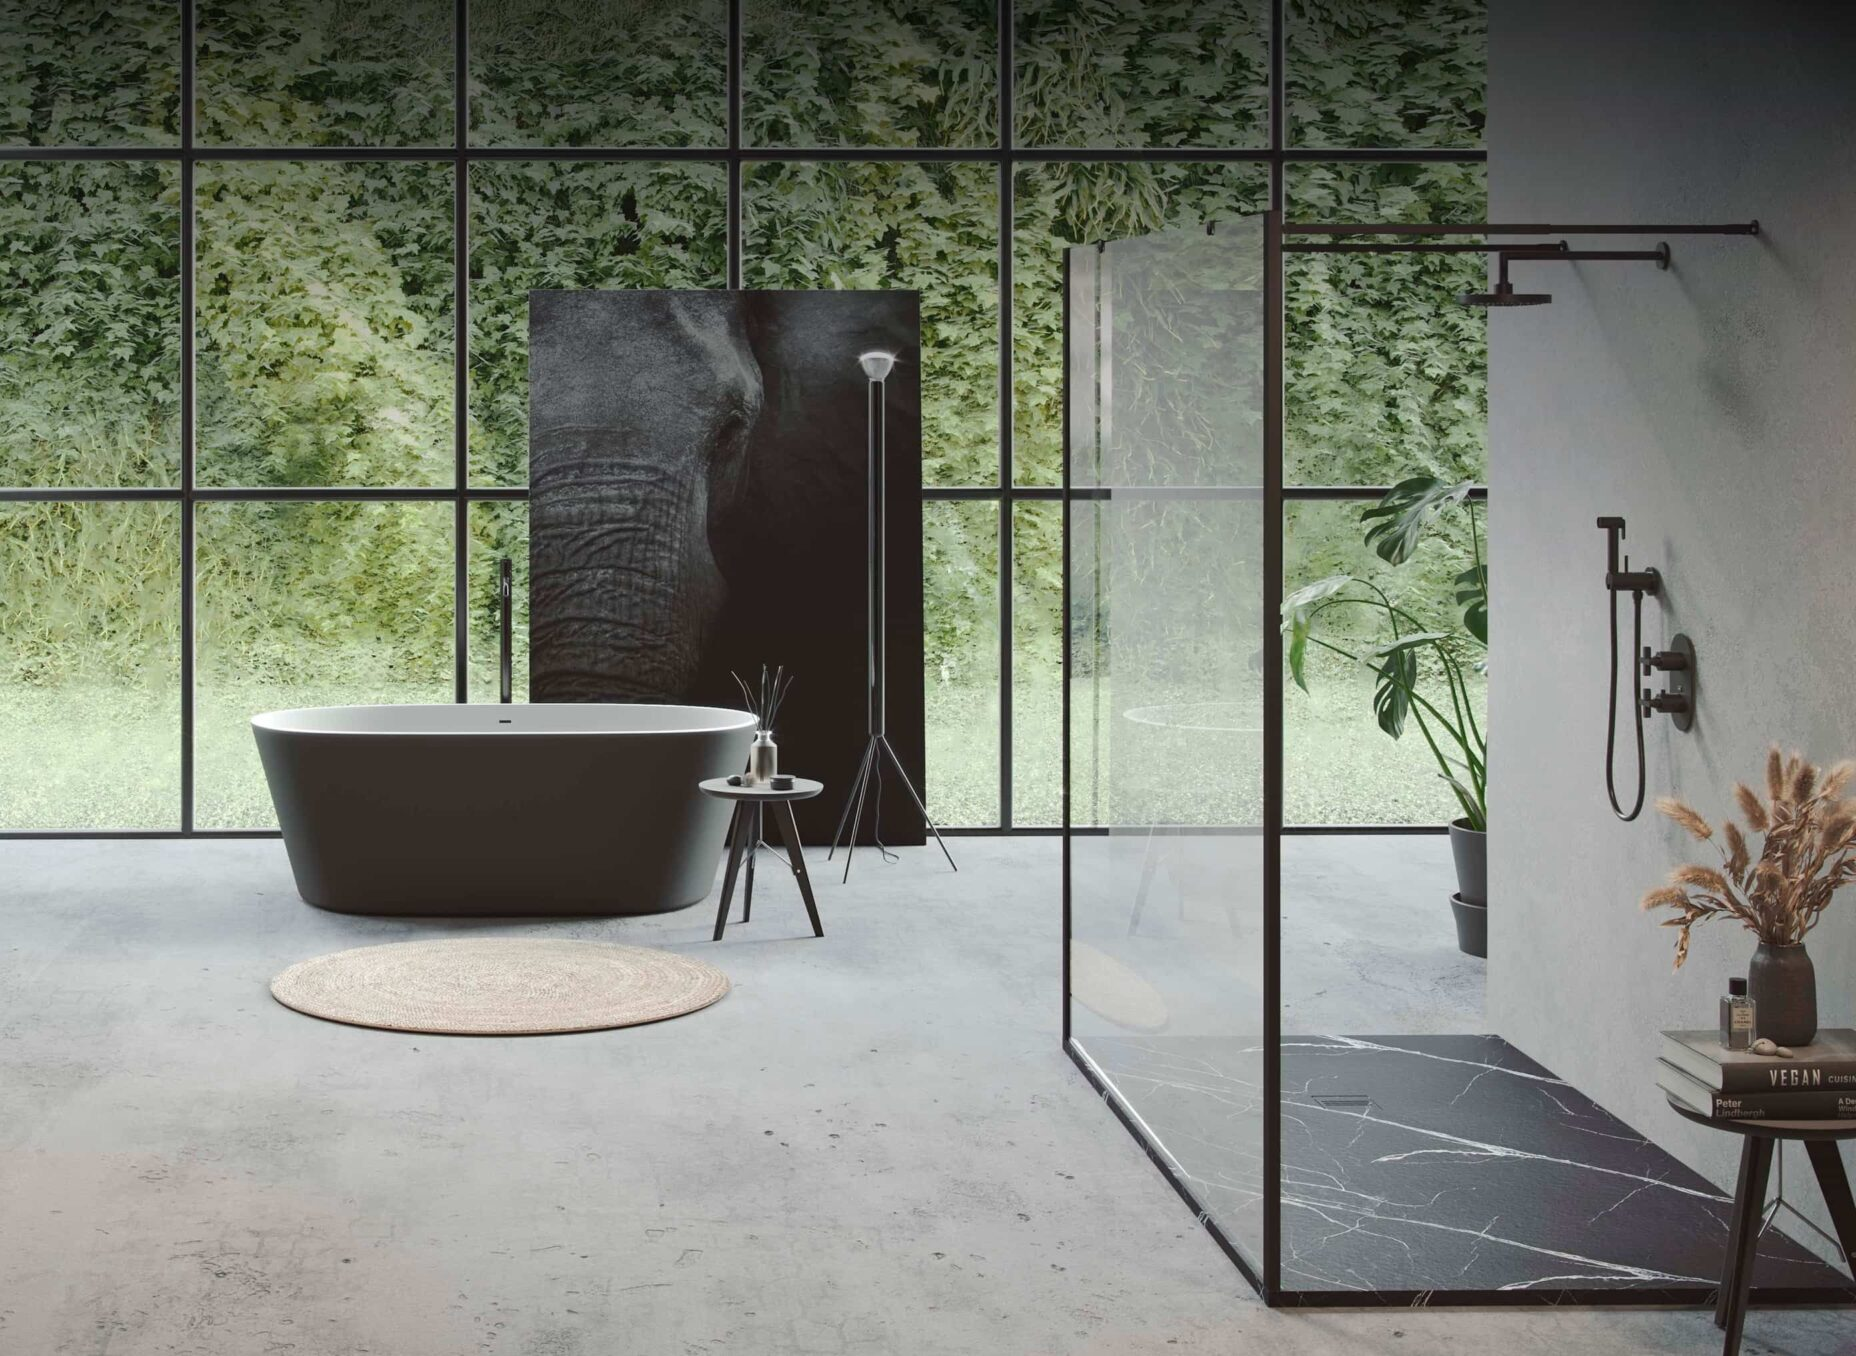 Tecnología Acryprint® para diseñar tu baño